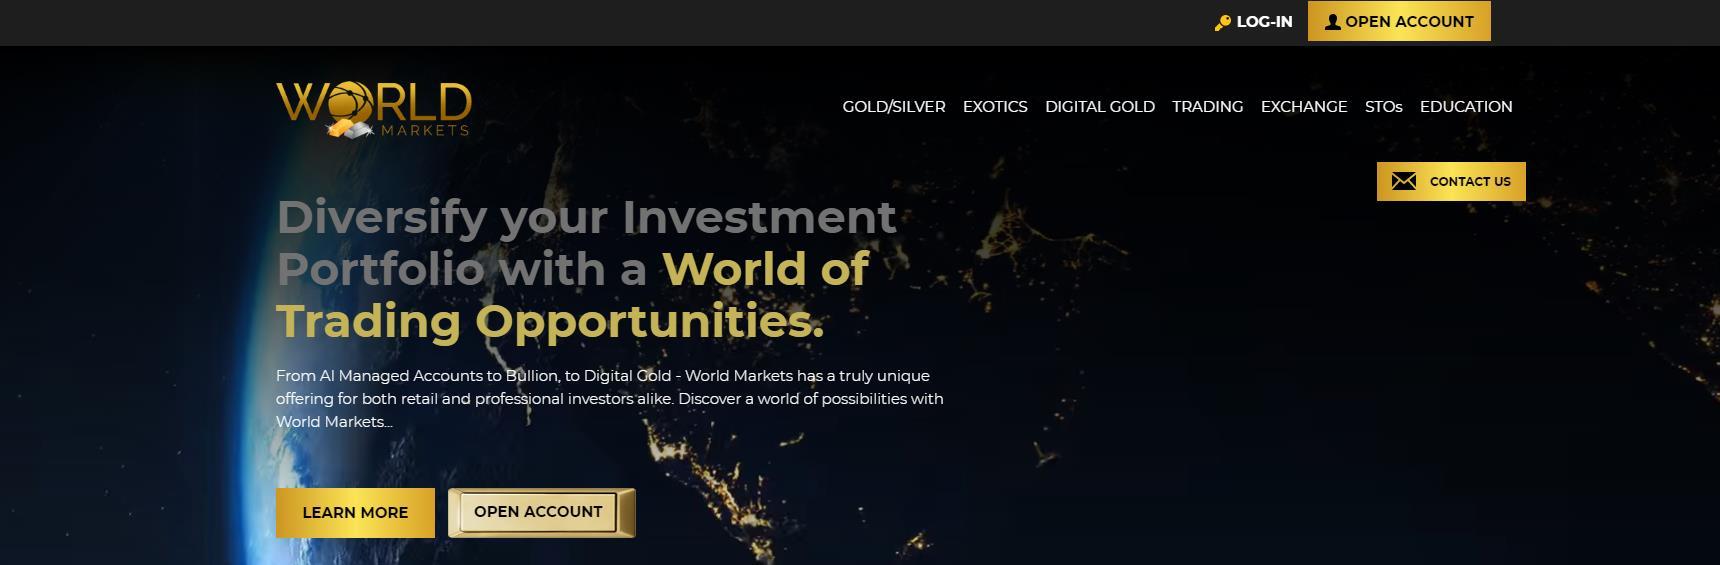 официальные сайт world markets